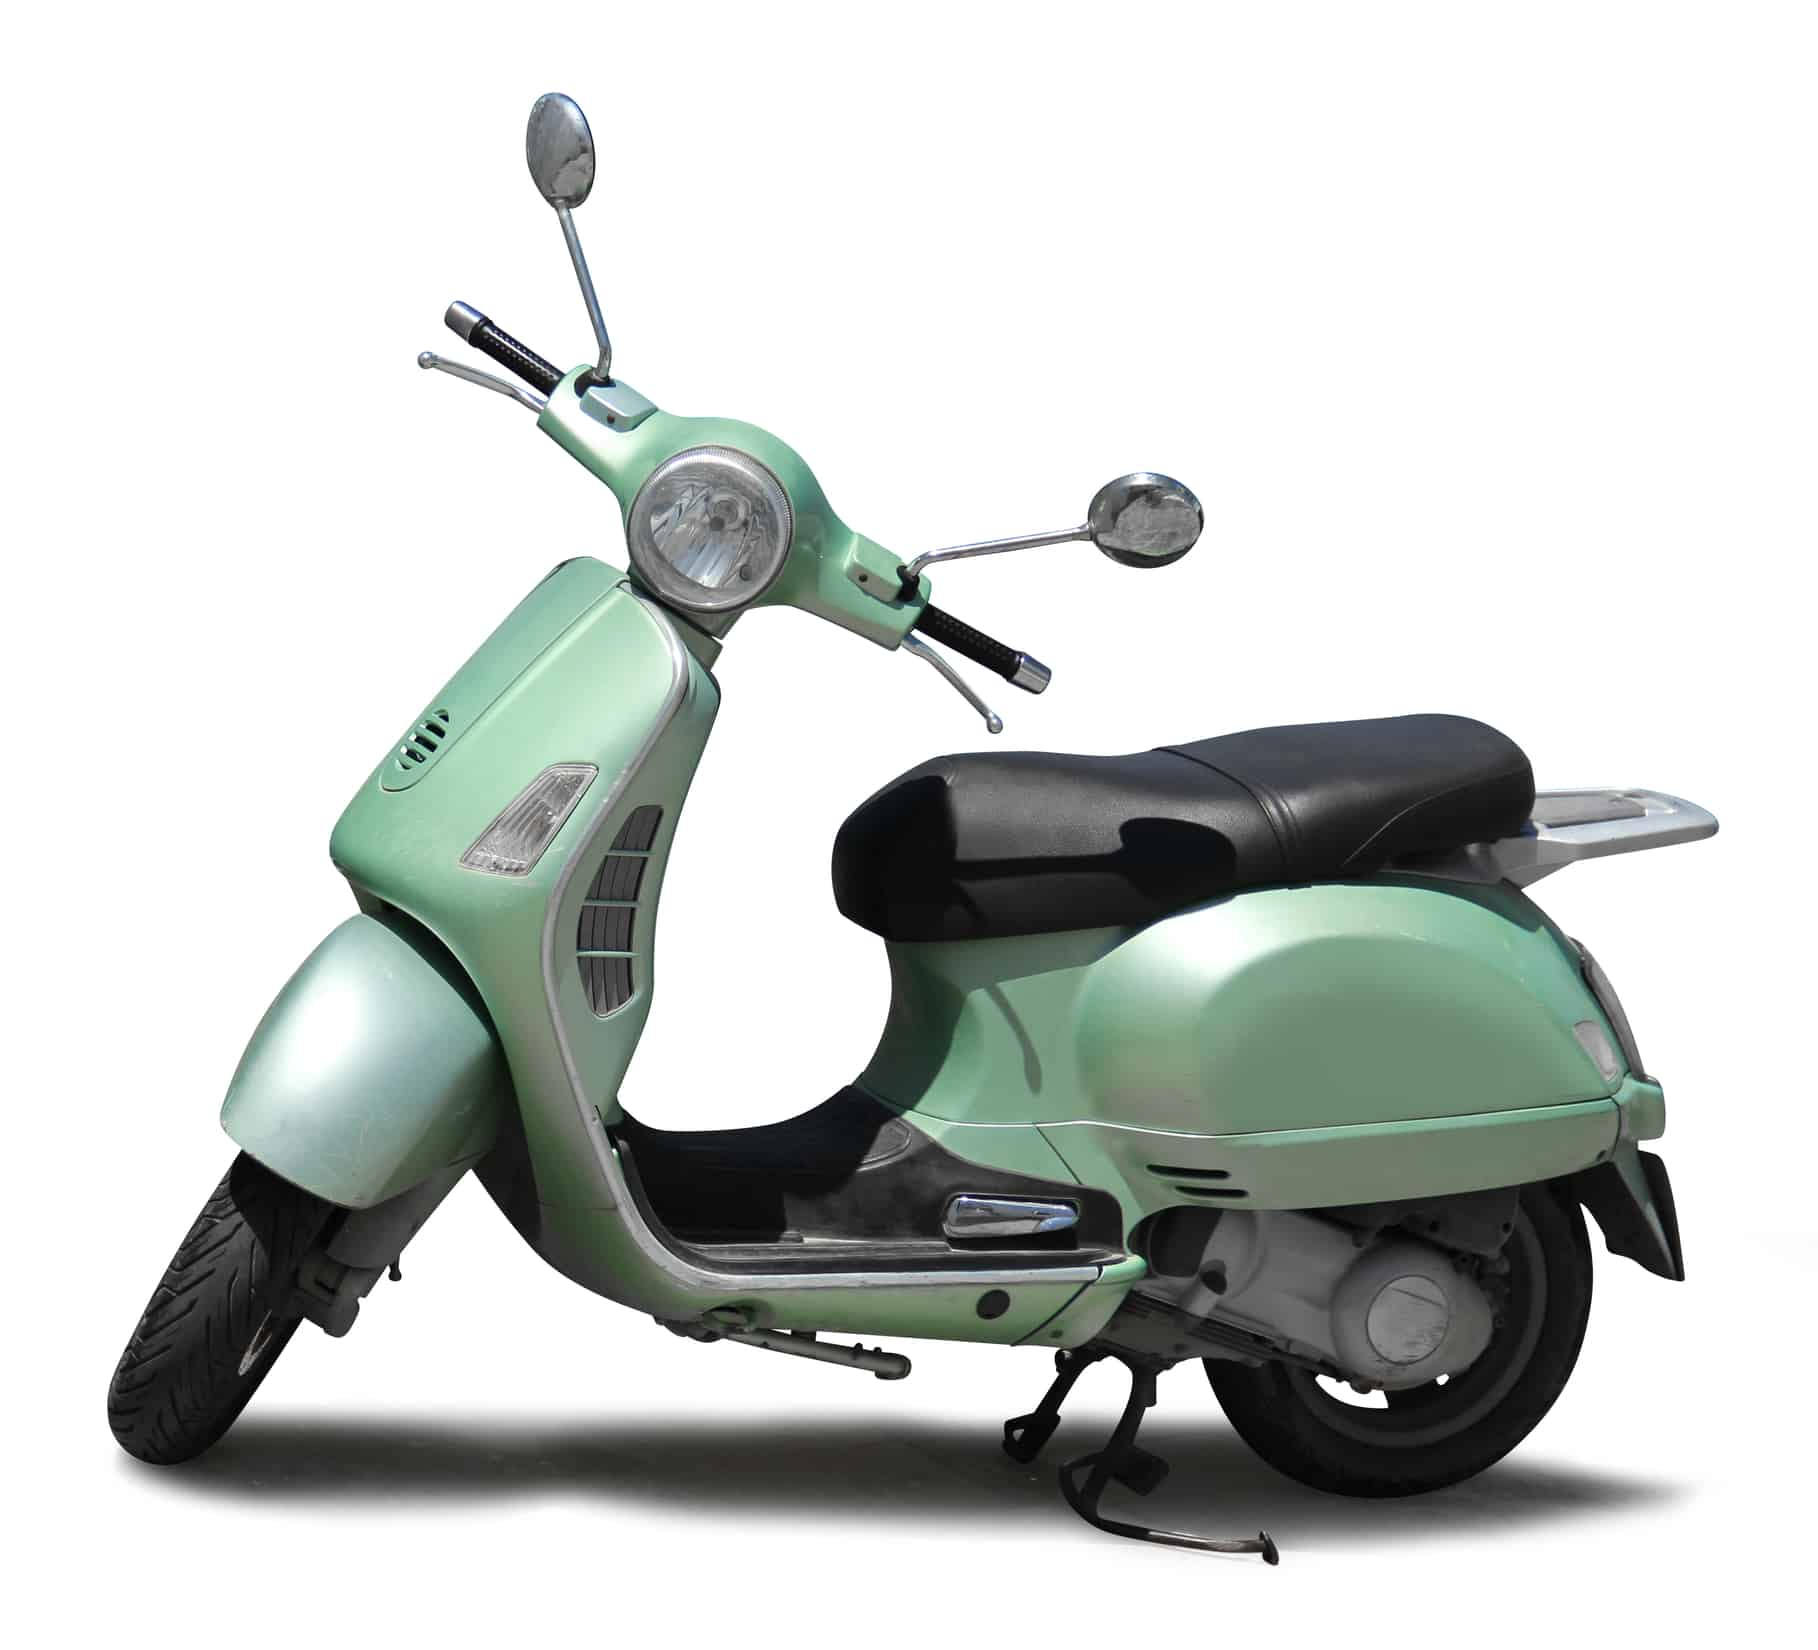 motorcykel kørekort amager